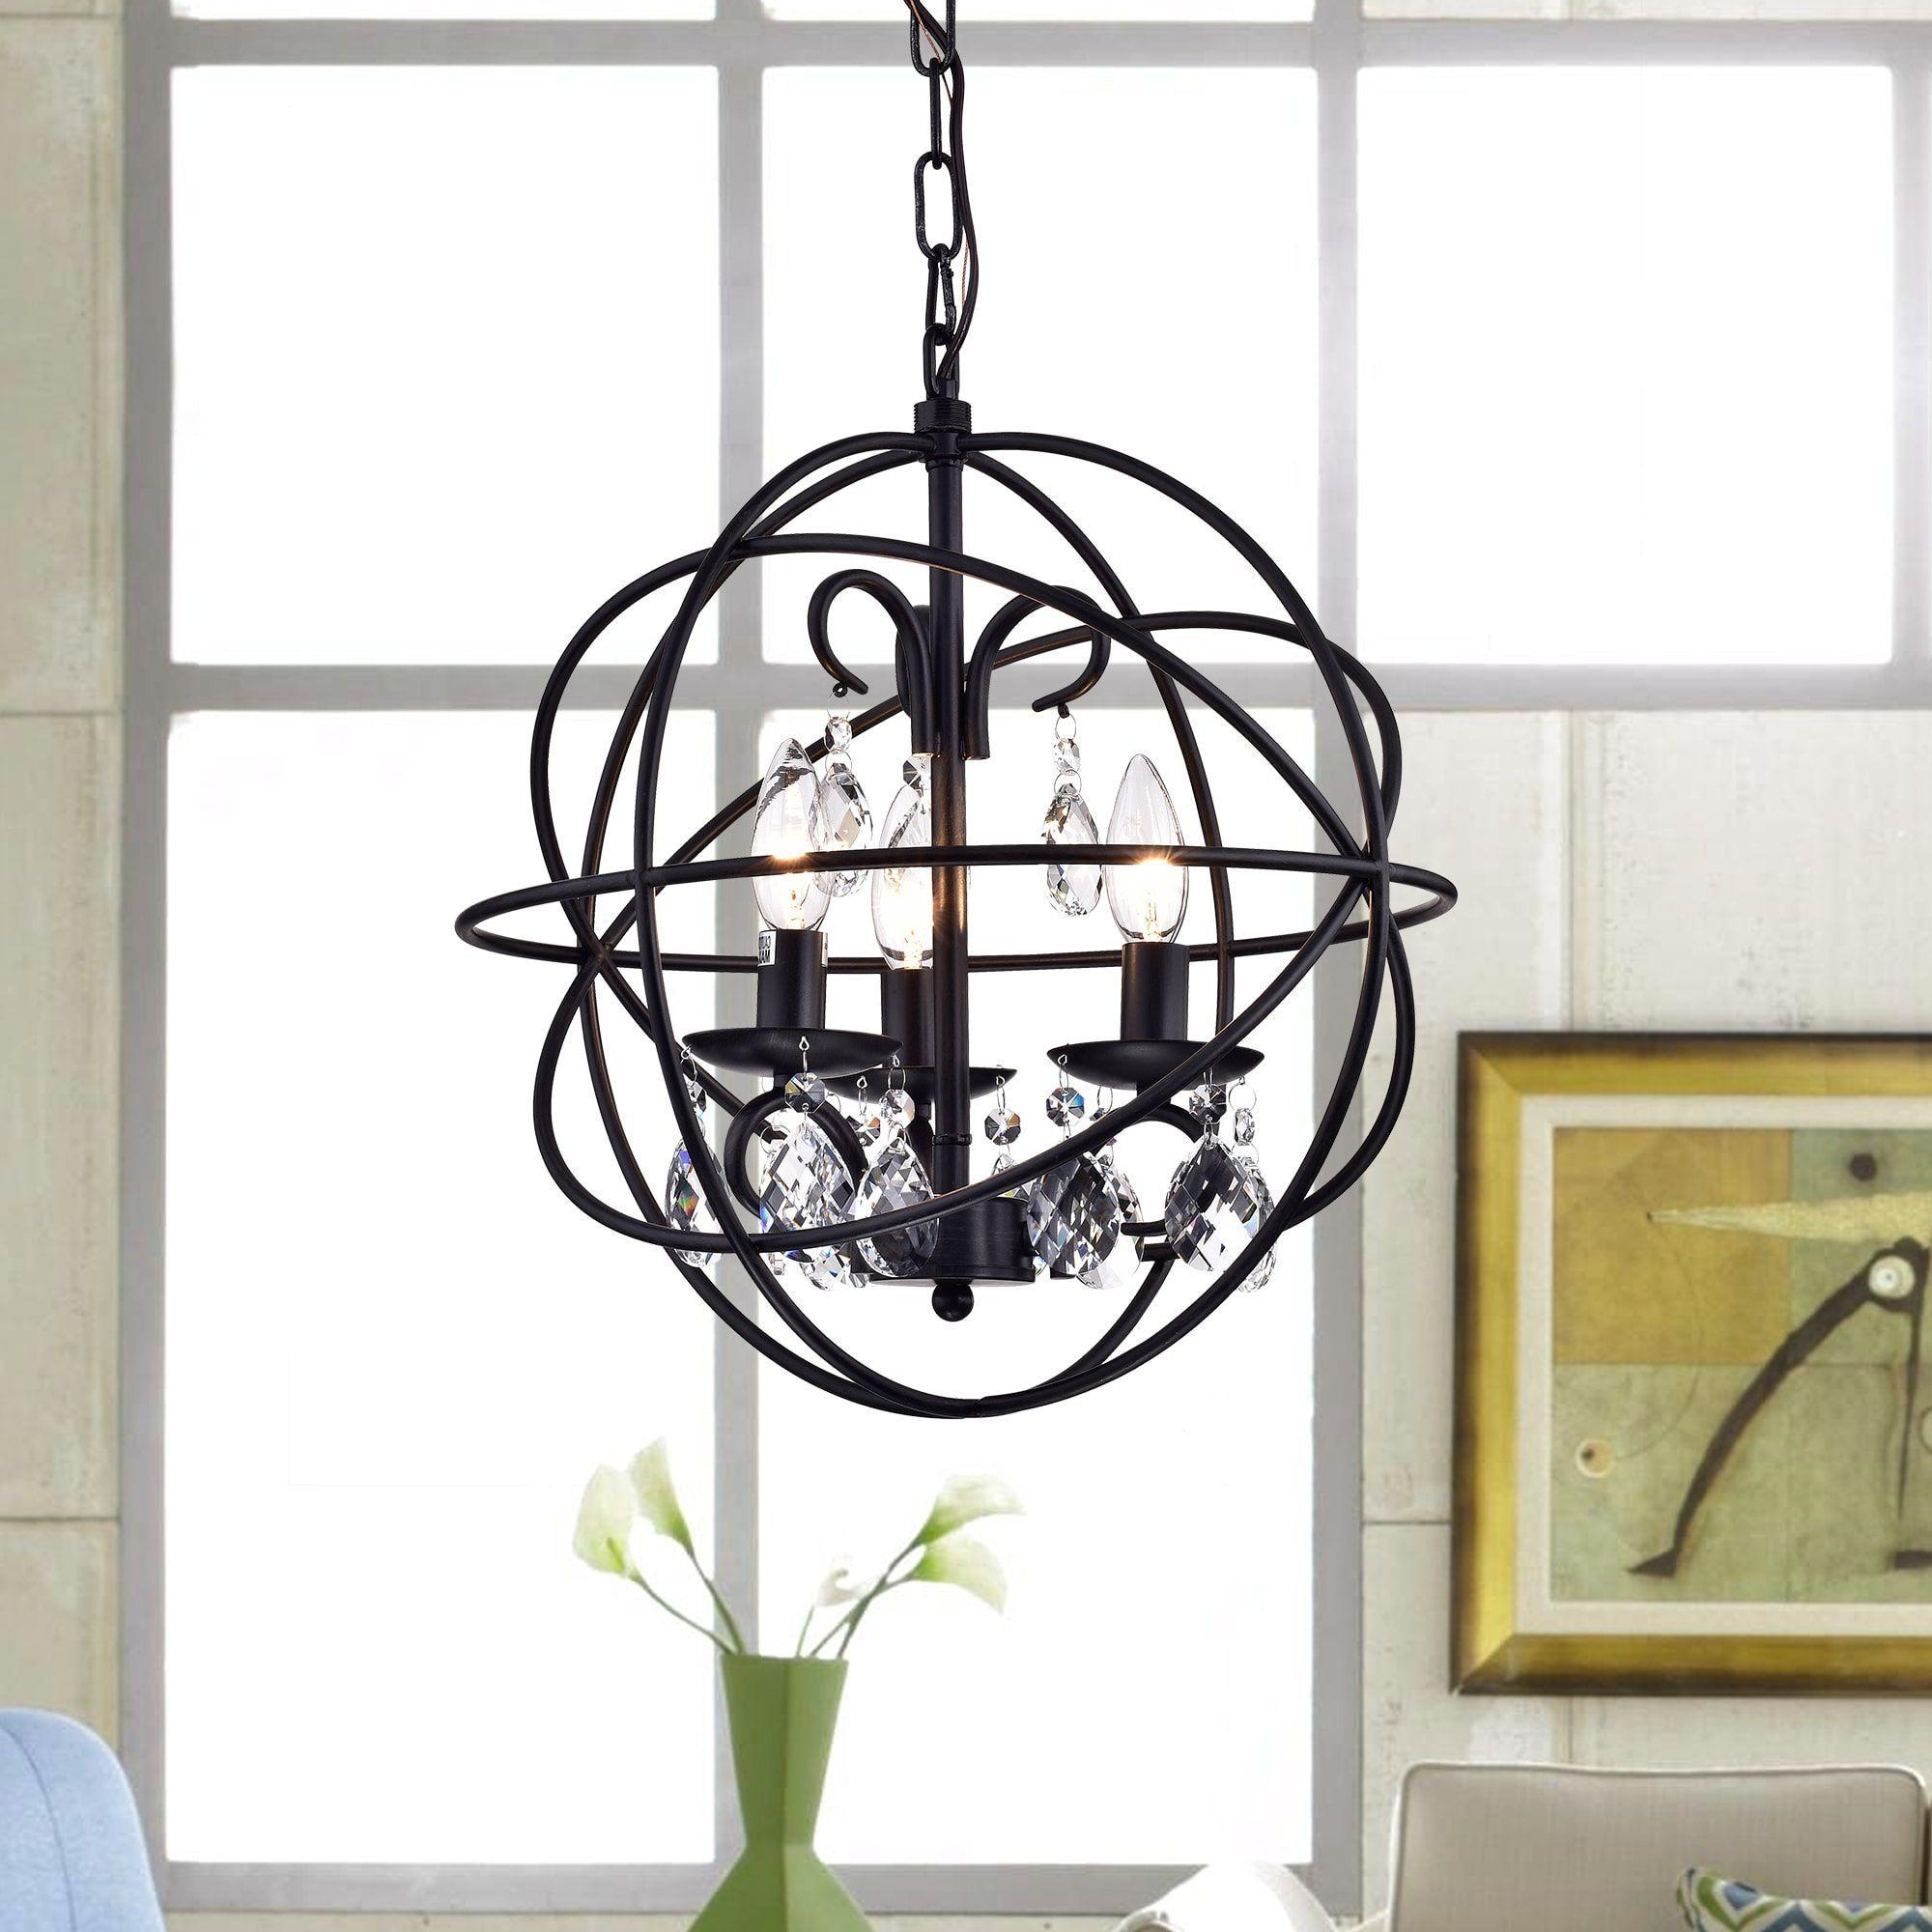 Recent Warehouse Of Tiffany Lijane 3 Light Crystal Black Metal Hoop Intended For Alden 3 Light Single Globe Pendants (View 17 of 20)